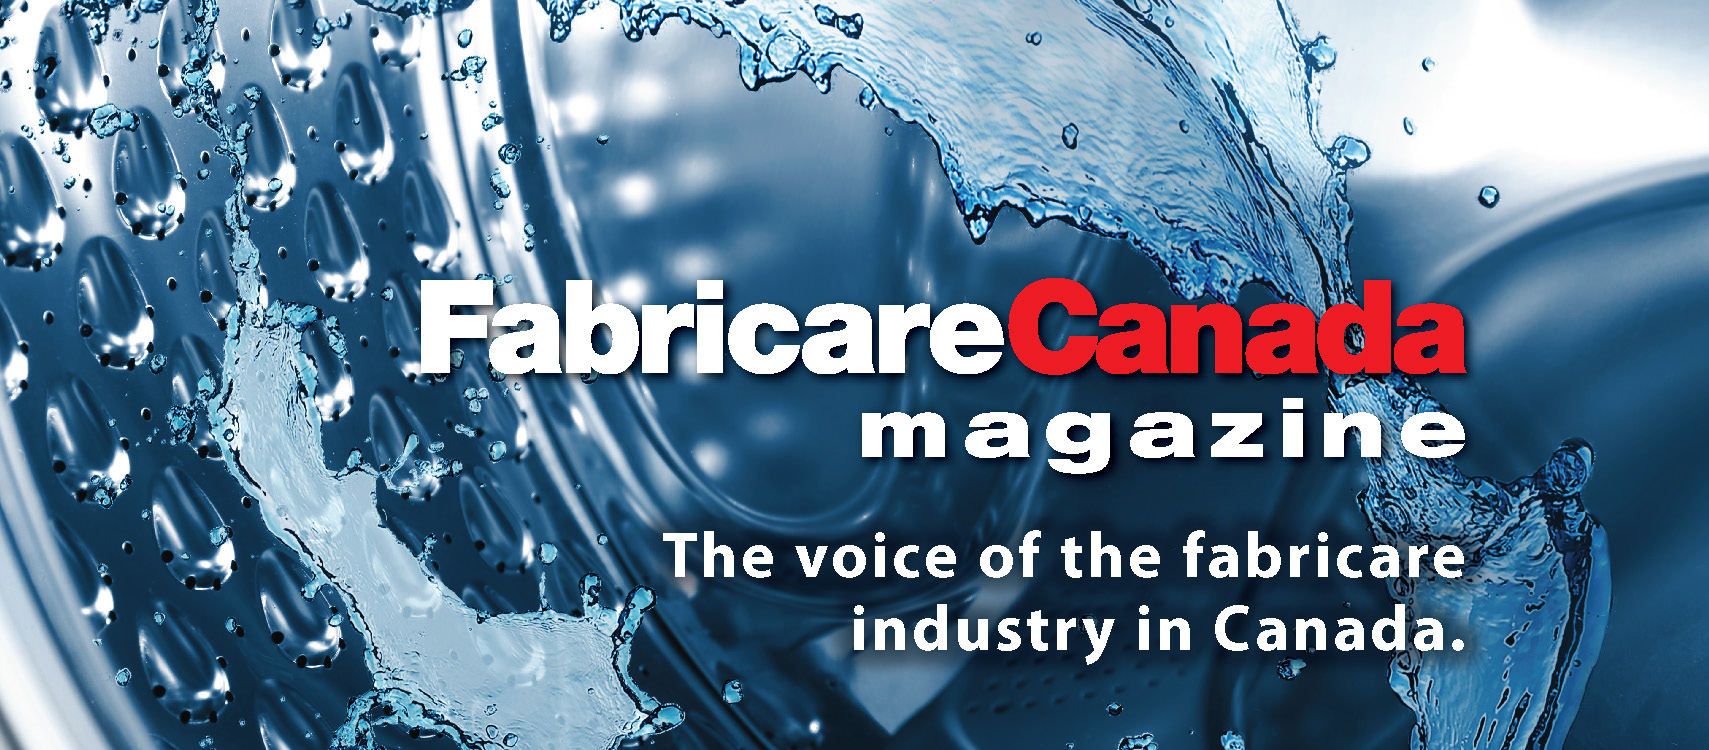 Fabricare Canada magazine